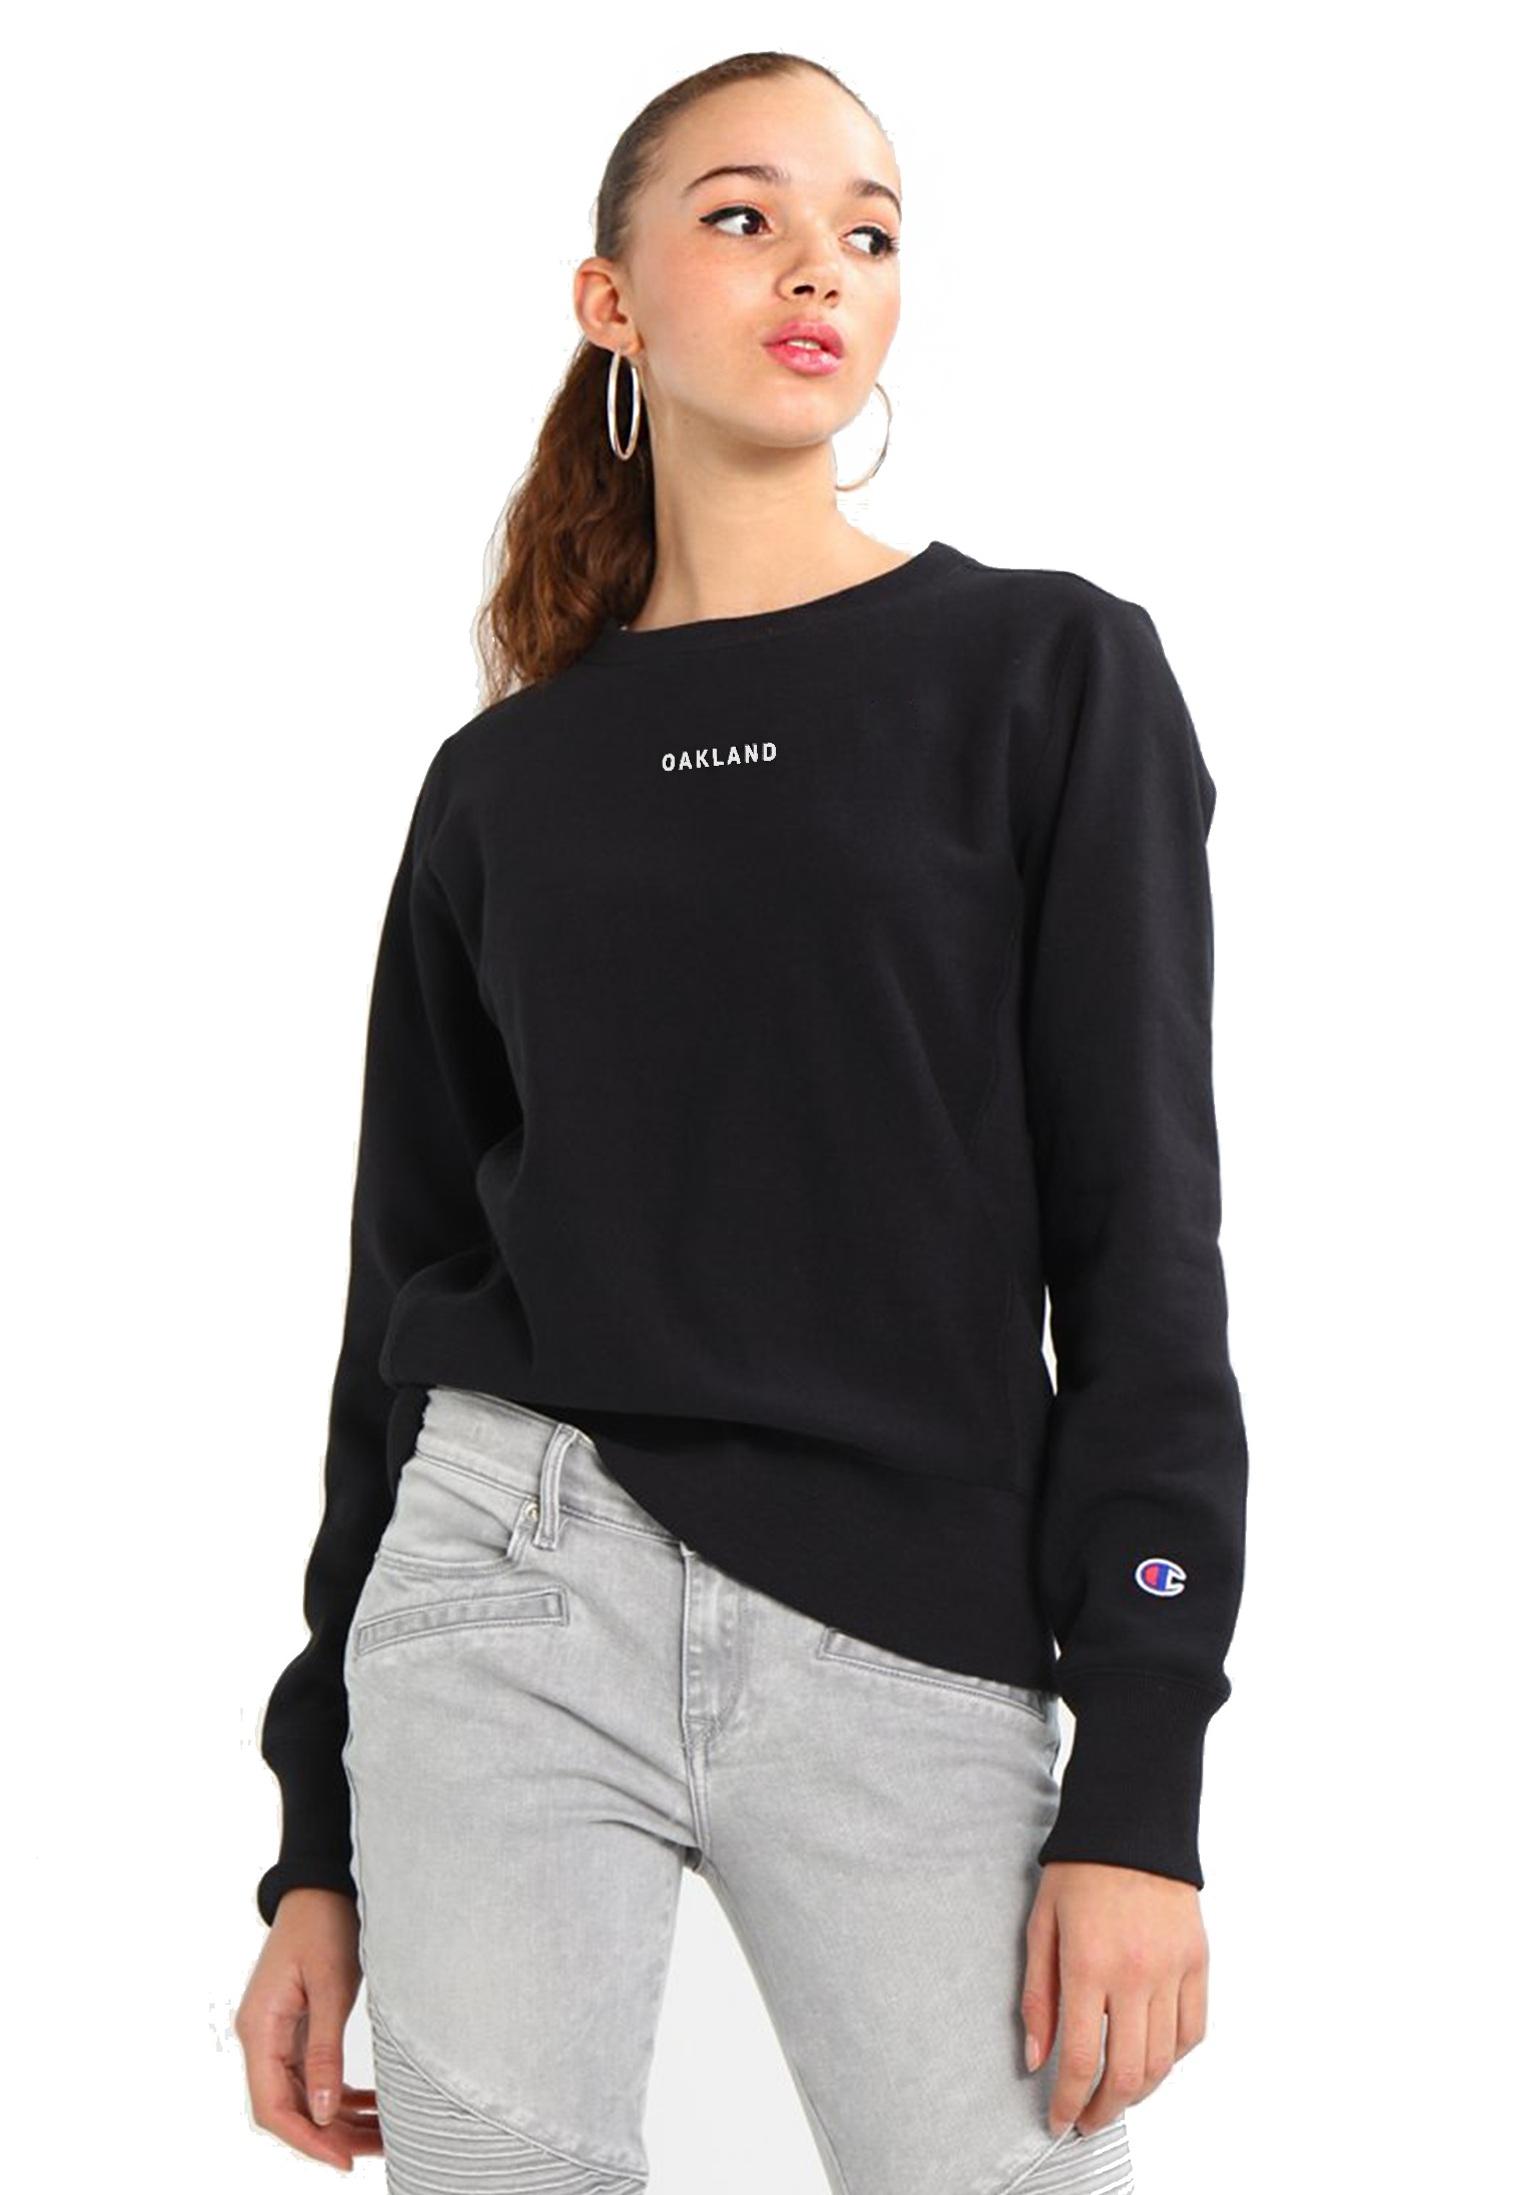 Sky Oak Co_THE BAY_Champion_black_reverse_weave_sweatshirt_woman_model_front_cover.png